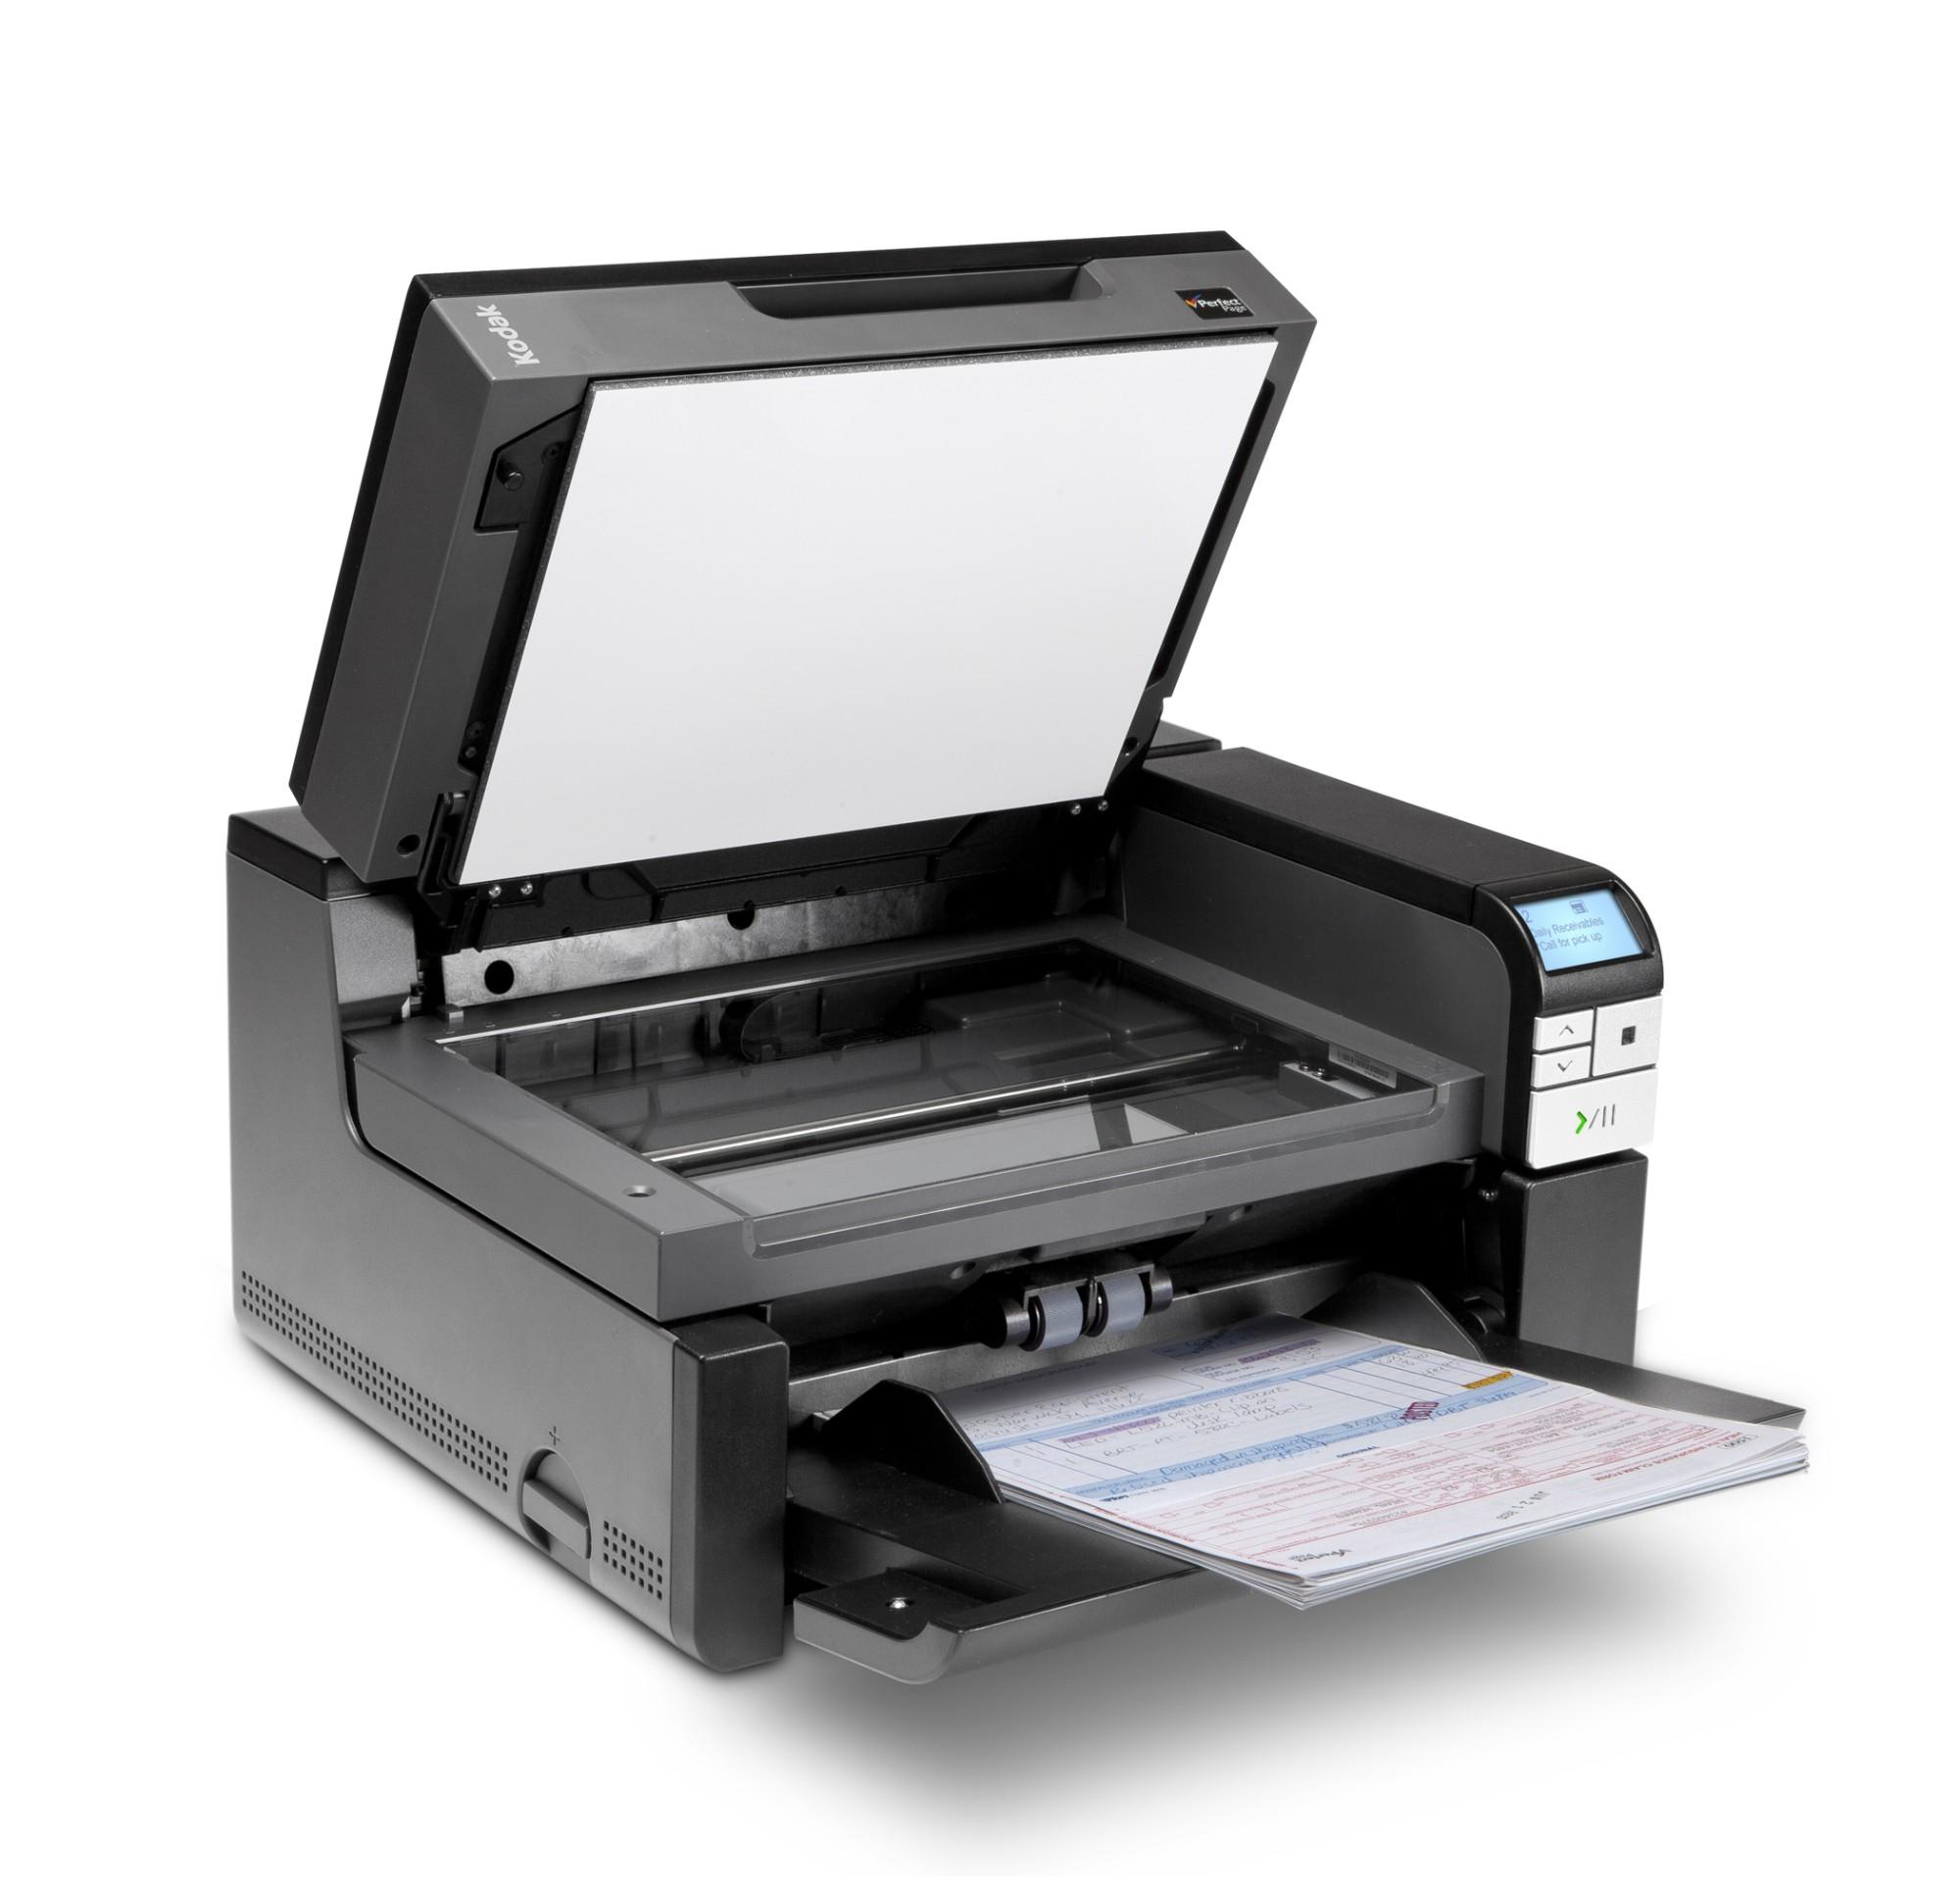 Kodak Alaris i2900 Scanner 600 x 600 DPI ADF scanner Black A4